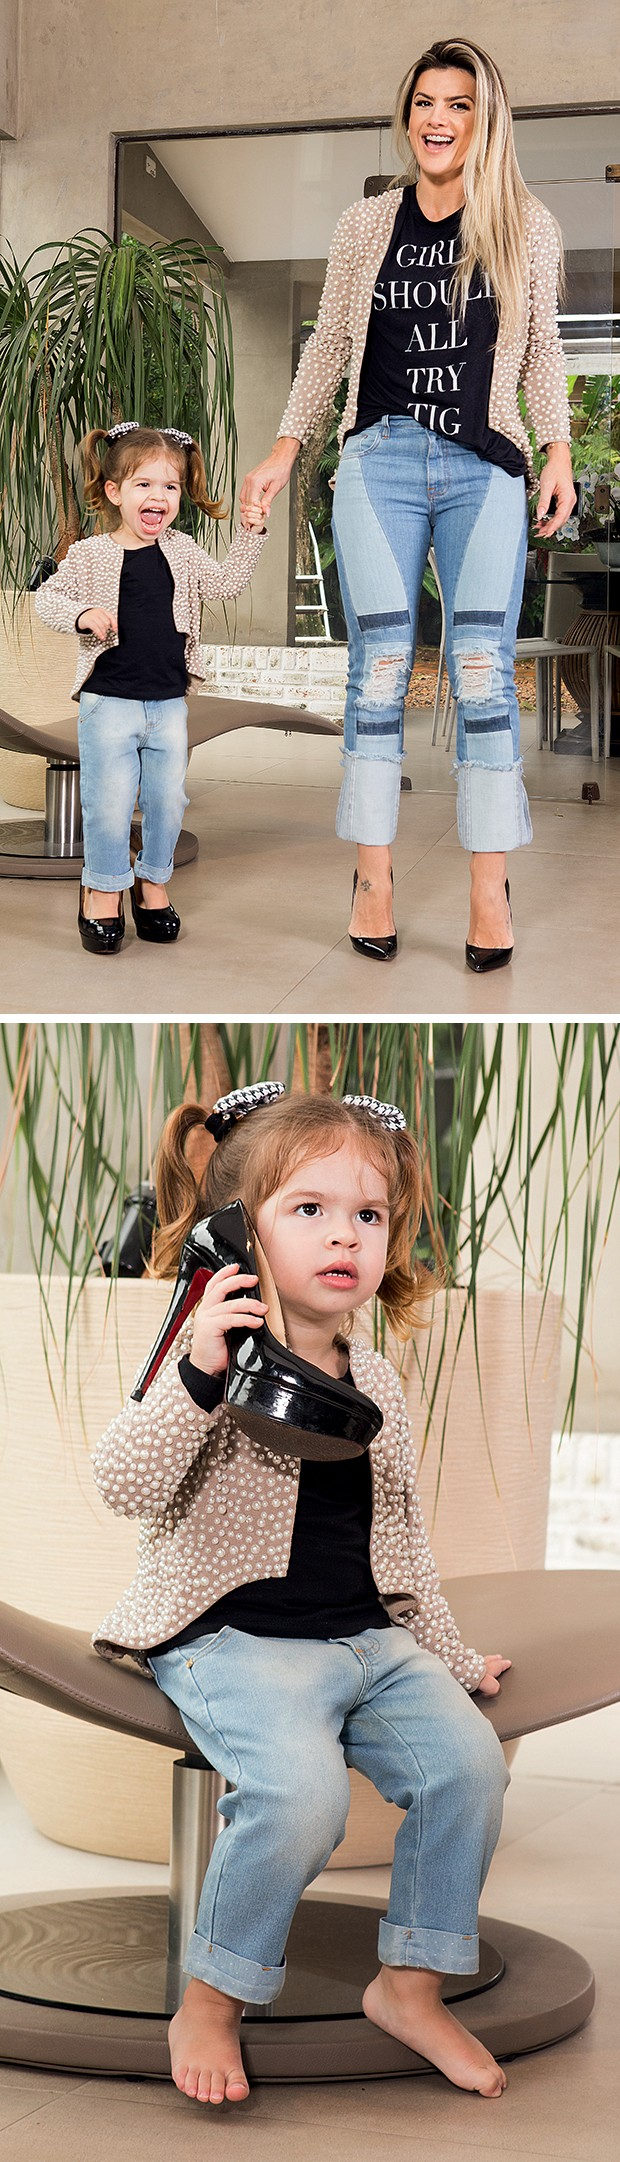 """A Valentina já pega meus  sapatos e consegue andar  com meus saltos de 16  centímetros"", conta Mirella  (Foto:  )"